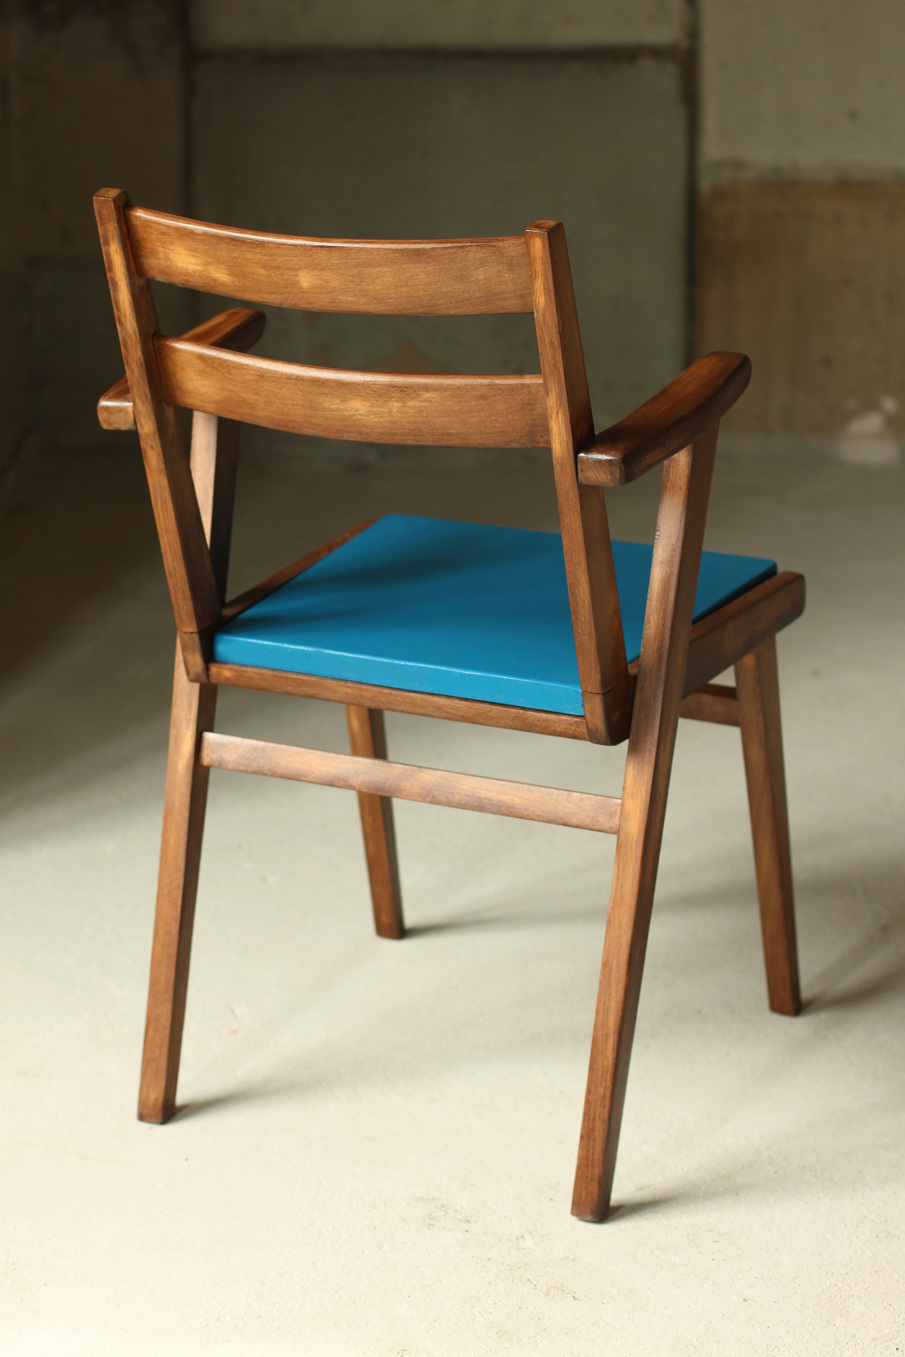 le petit fauteuil bleu de derri re les fagots. Black Bedroom Furniture Sets. Home Design Ideas